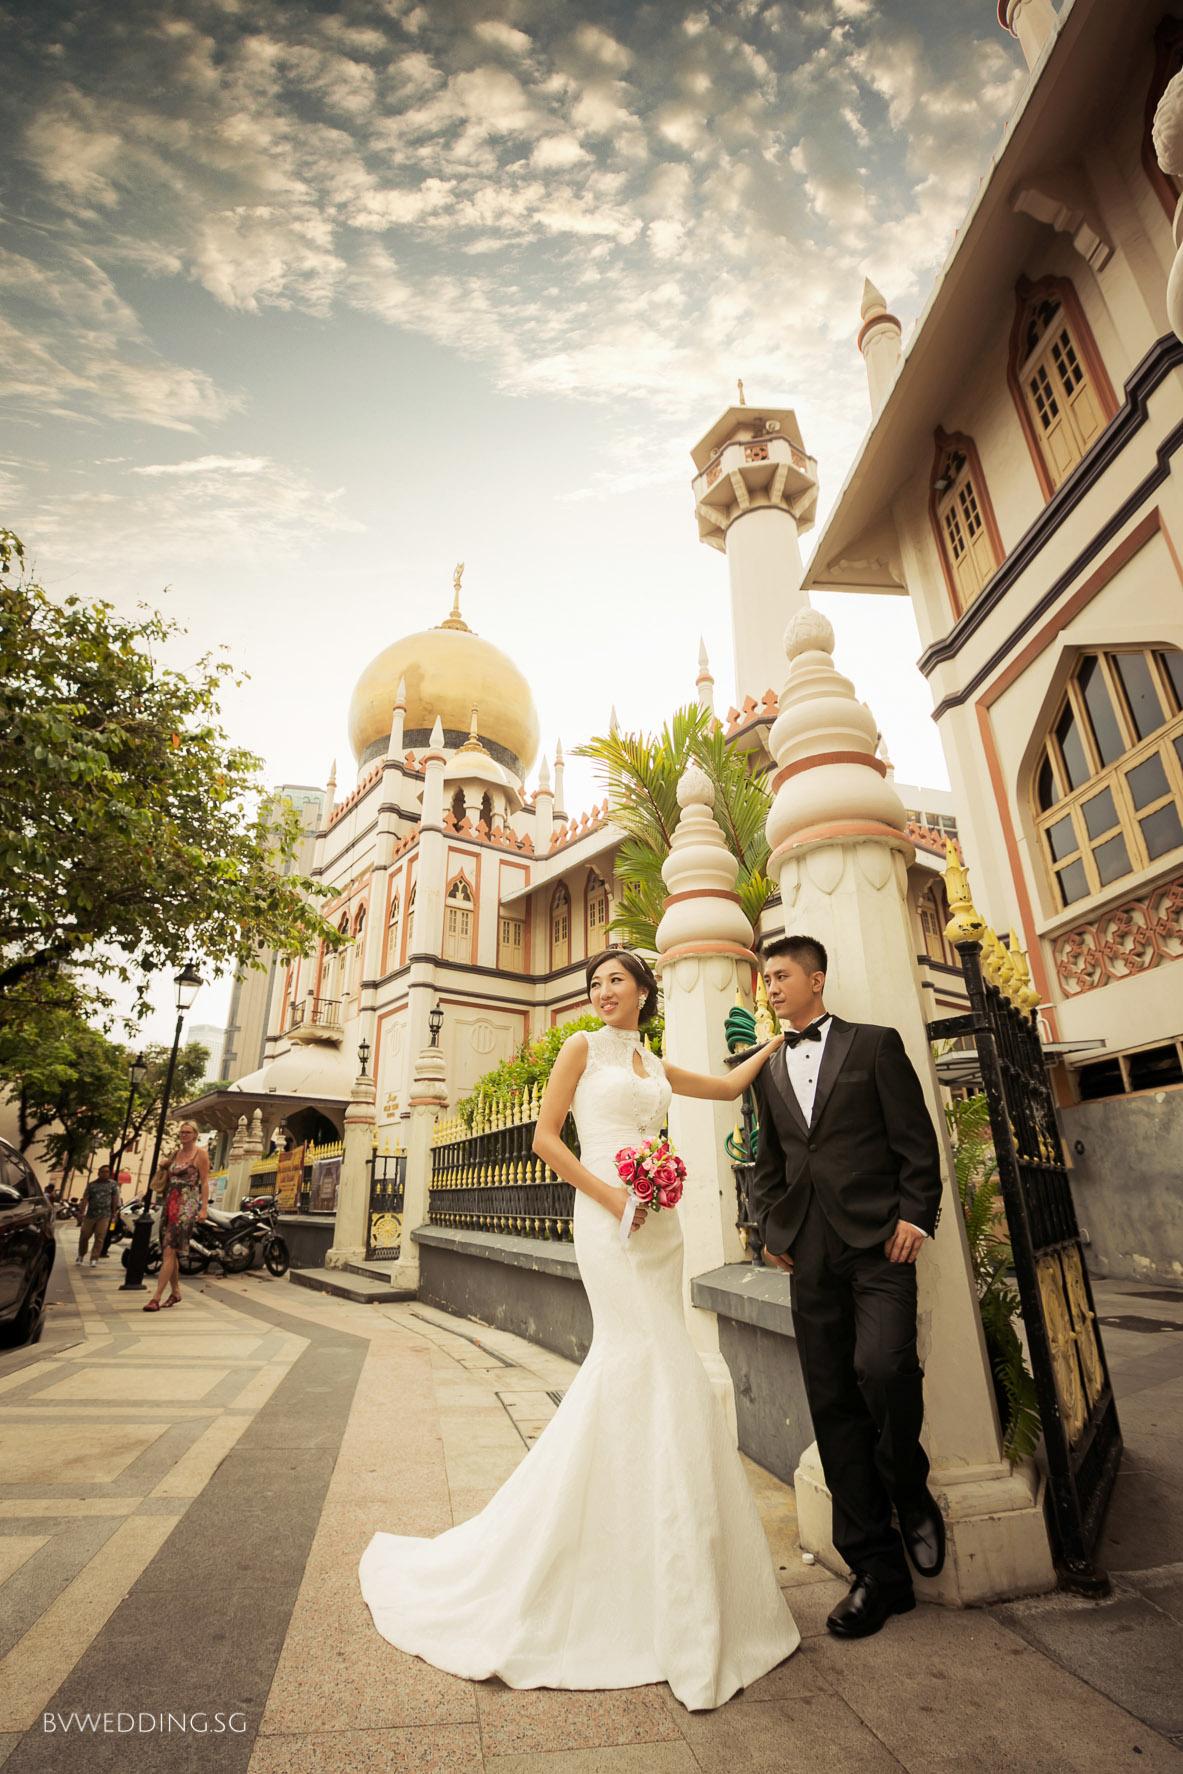 Pre-wedding Photoshoot at Sultan Mosque